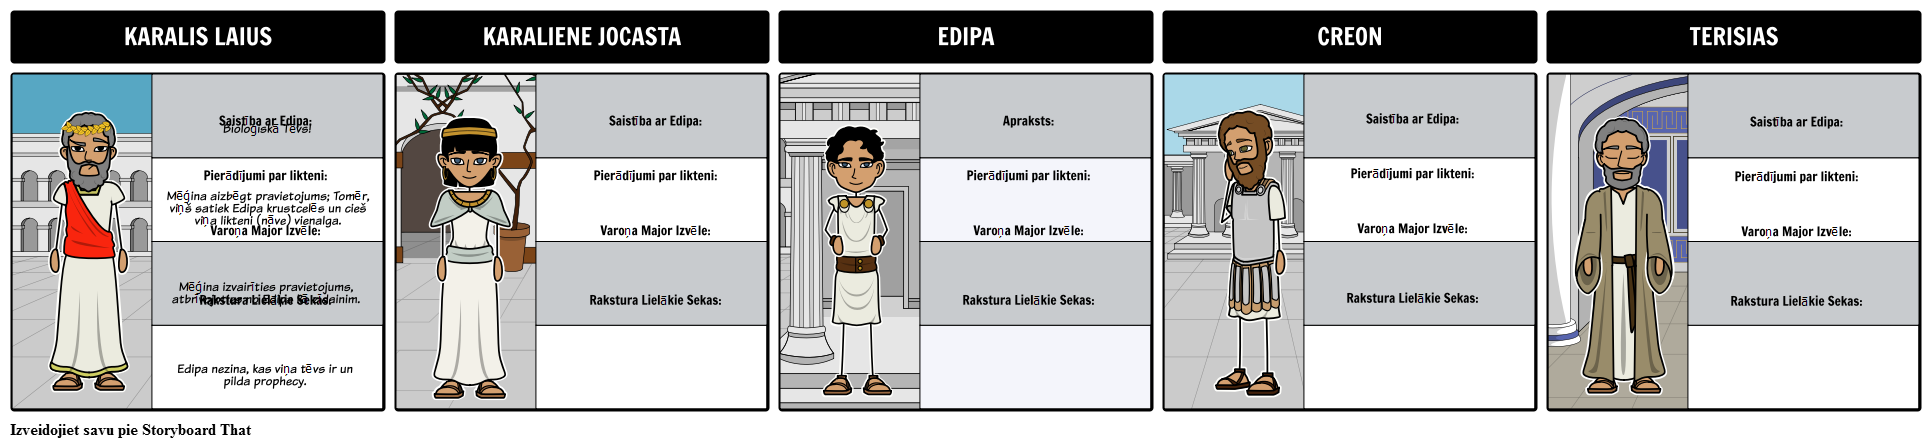 Edipa - Rakstzīmju Karte